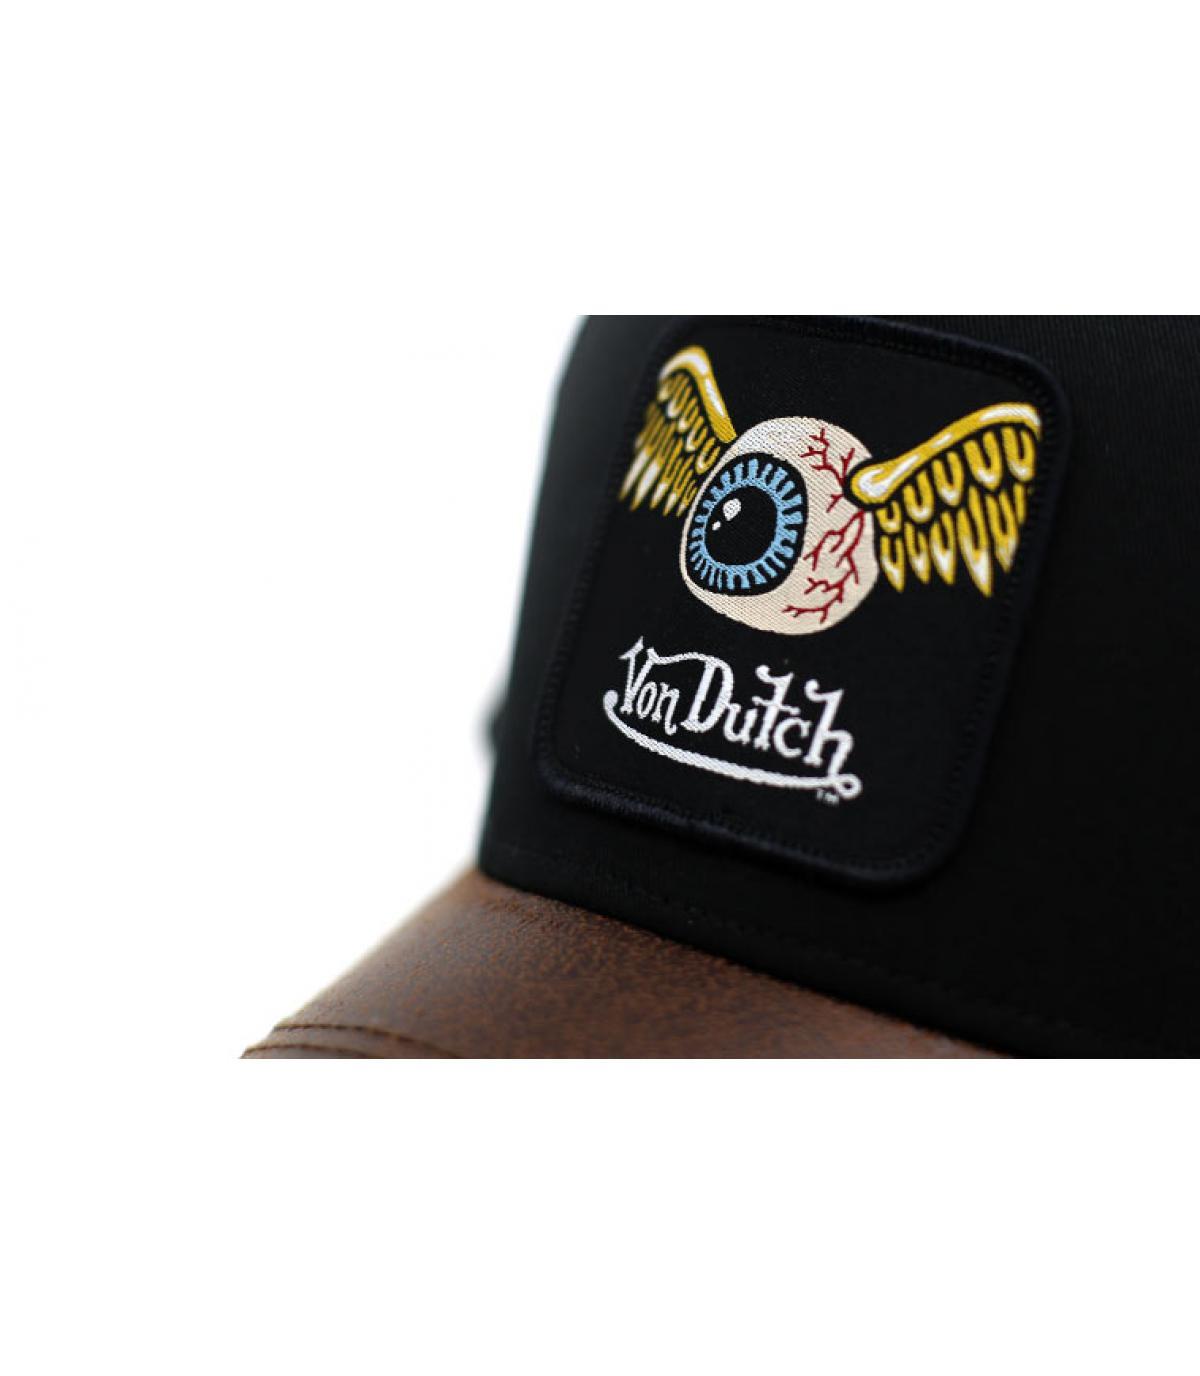 Detalles Trucker Eye Patch black brown imagen 3